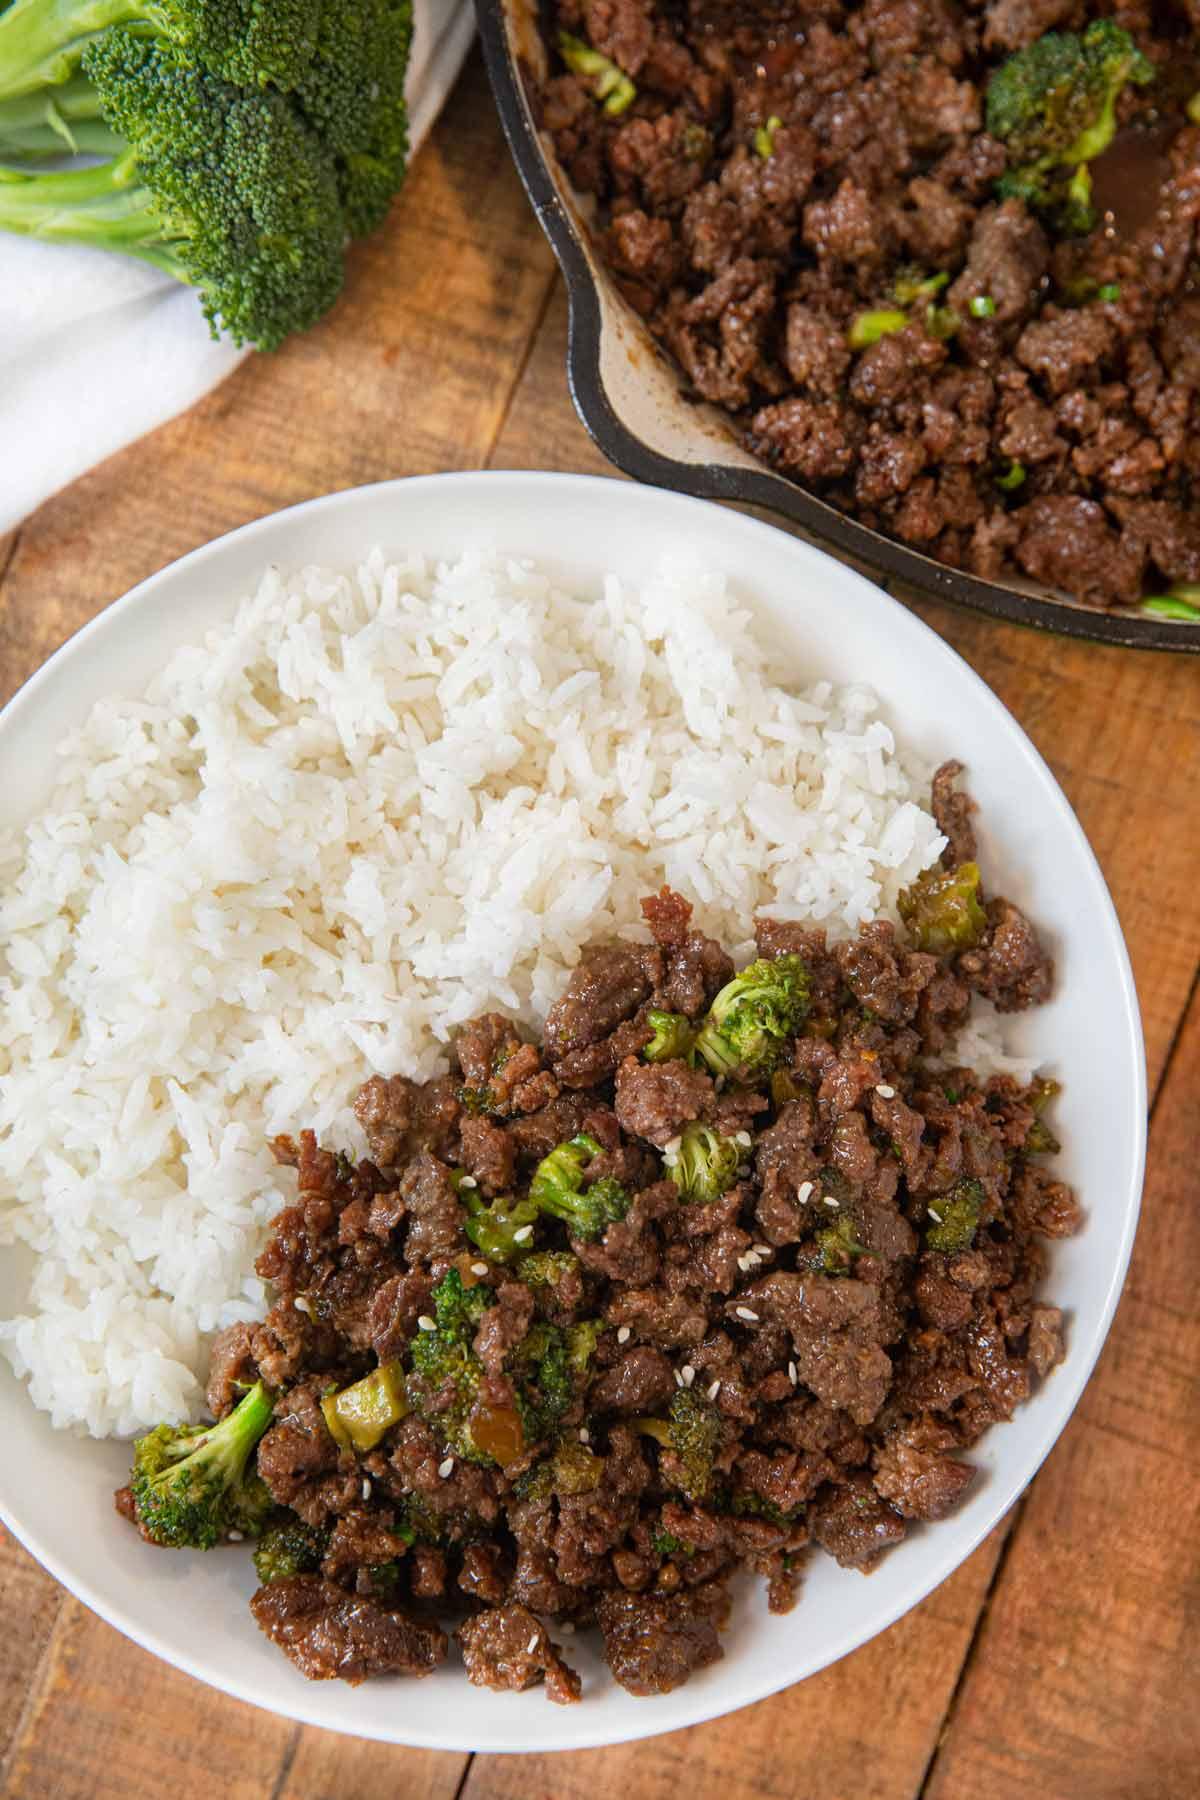 Ground Beef and Broccoli Recipe - Dinner, then Dessert